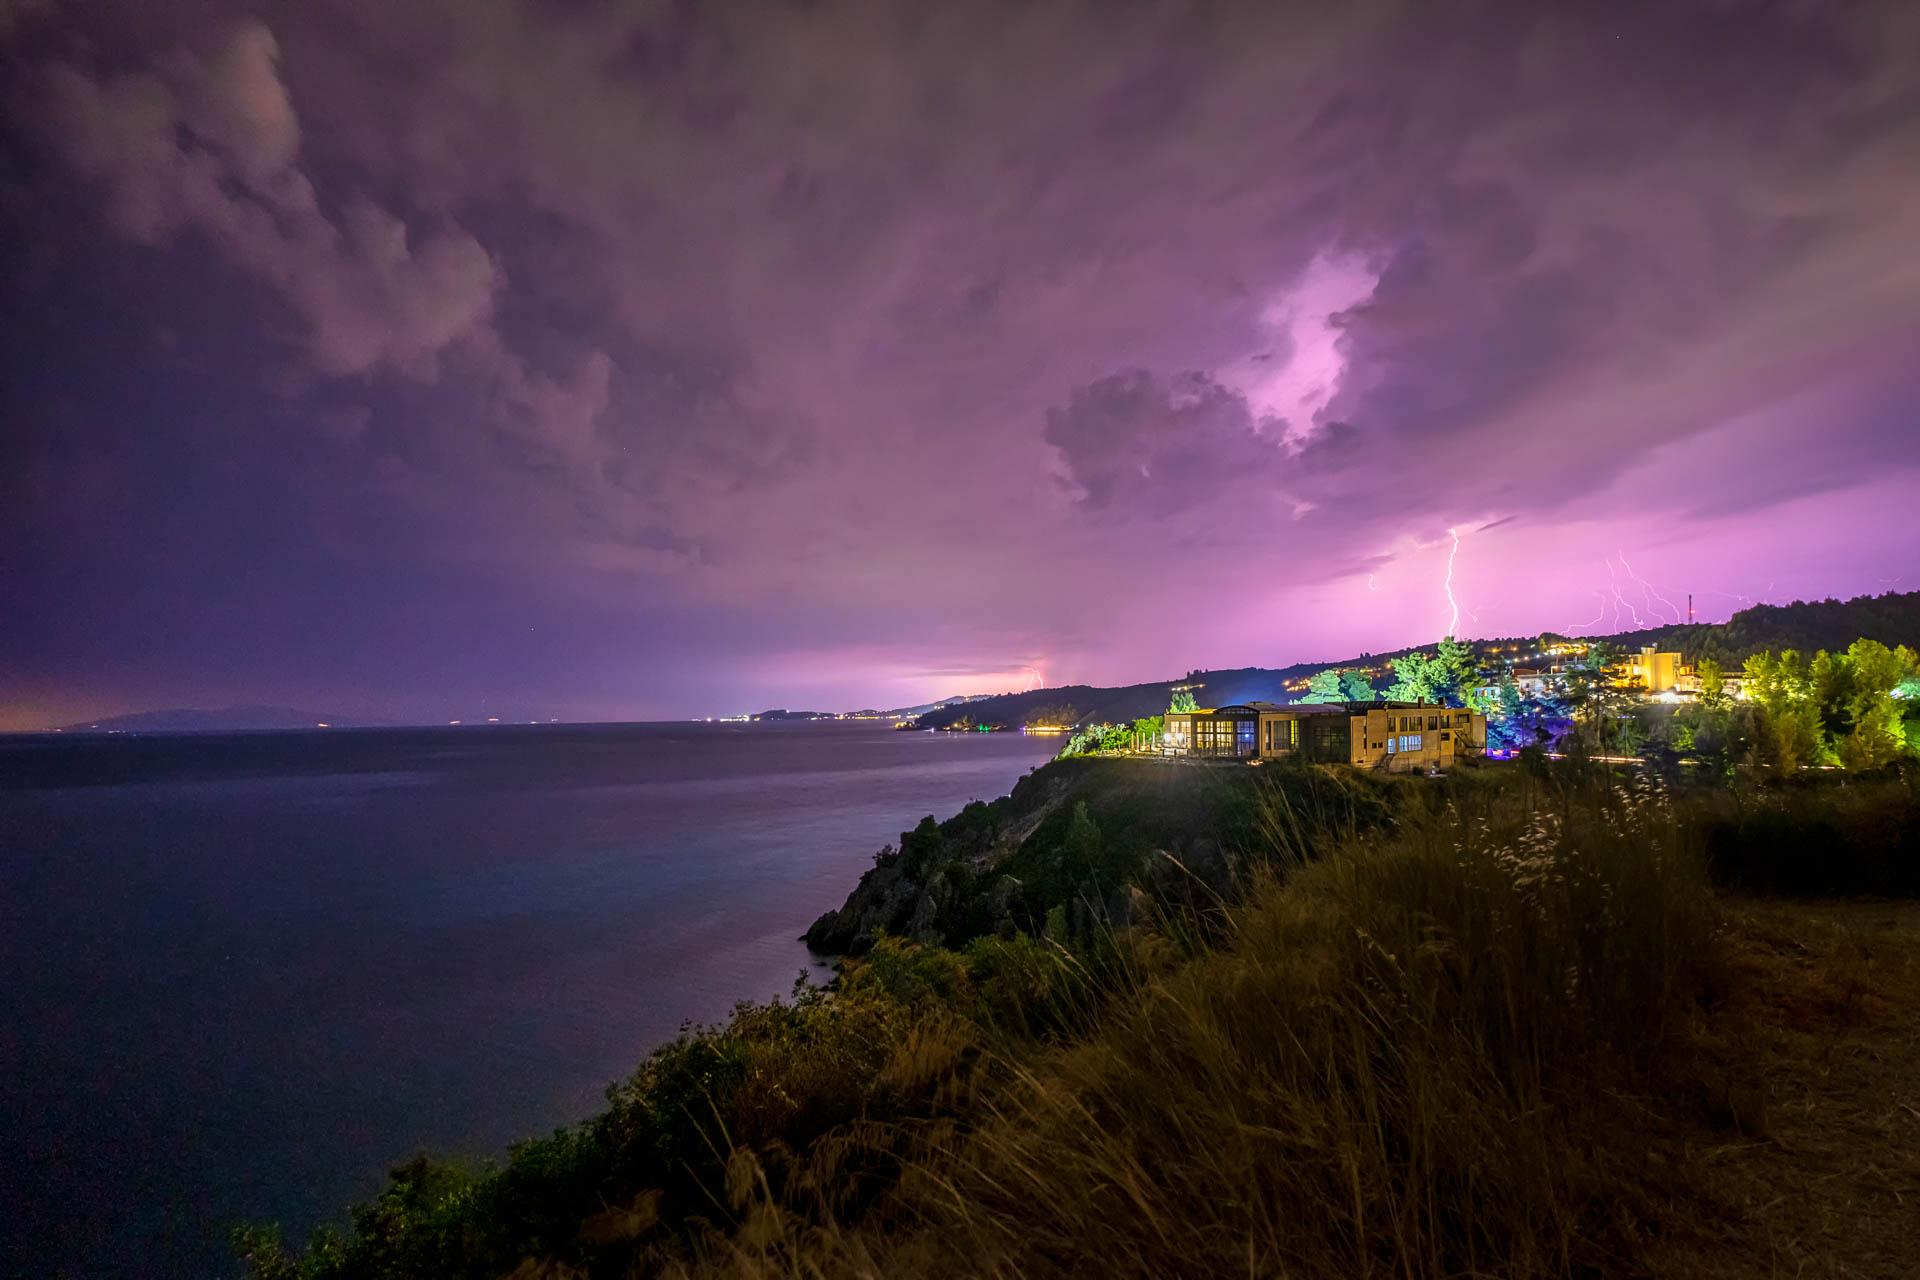 Thundestorm at Loutra Agias Paraskevis